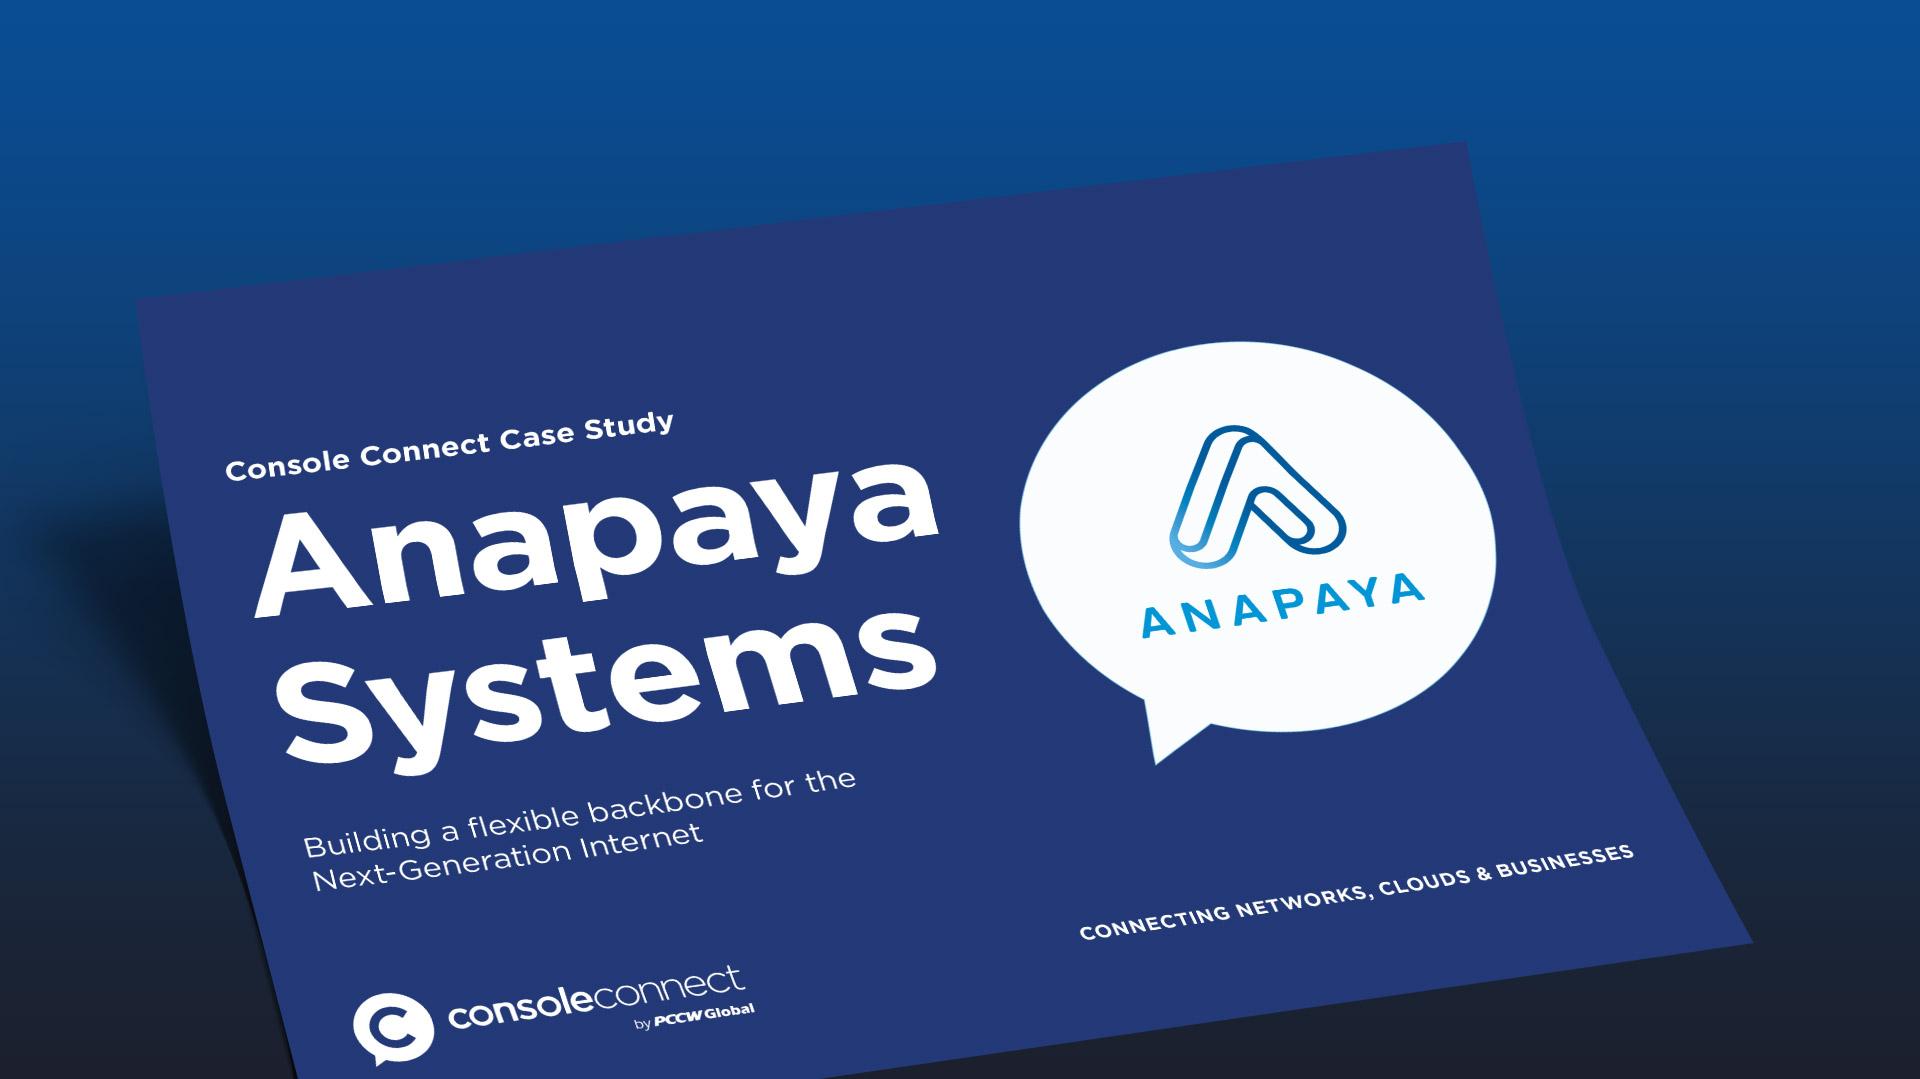 Anapaya-Callout-Console-Connect-case-study